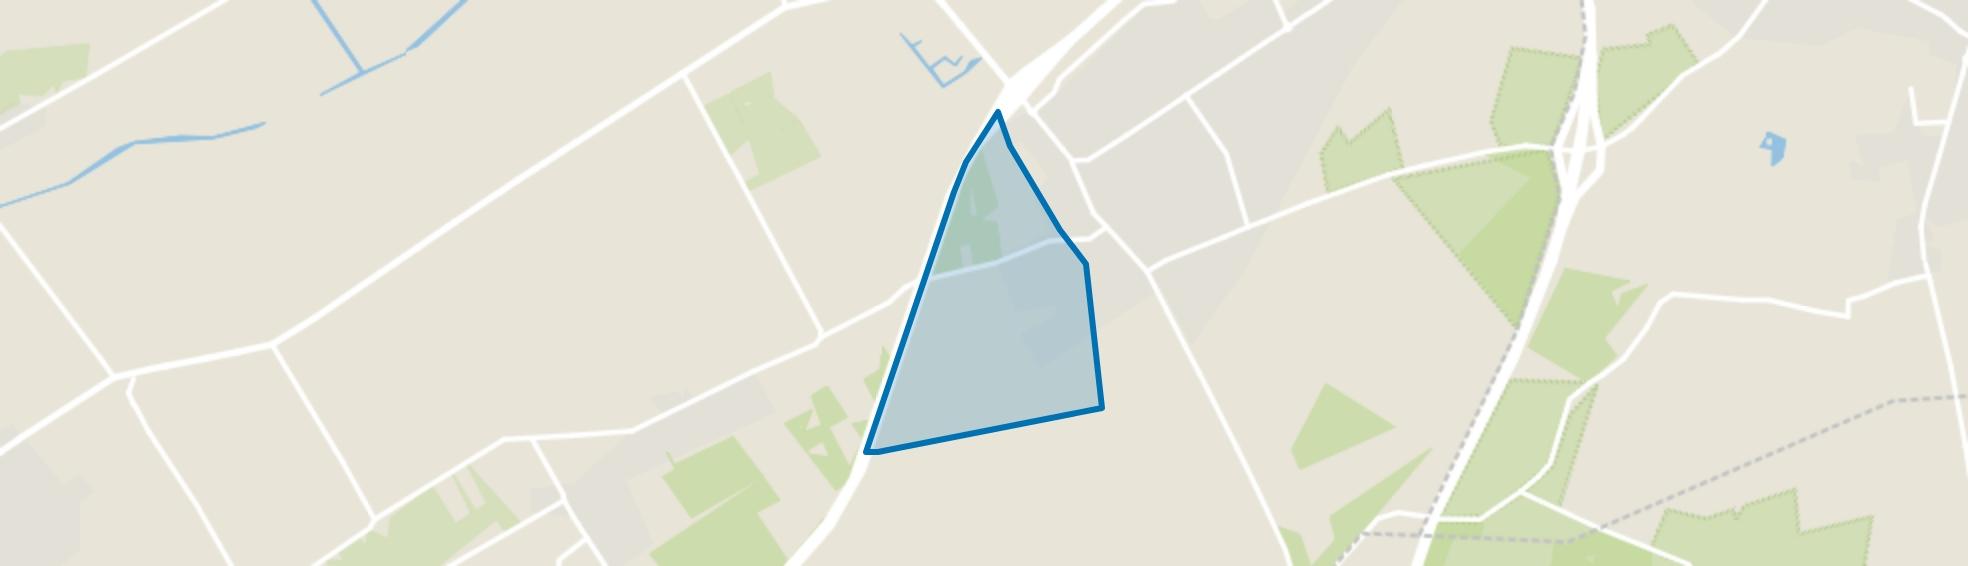 Wezep-West, Wezep map